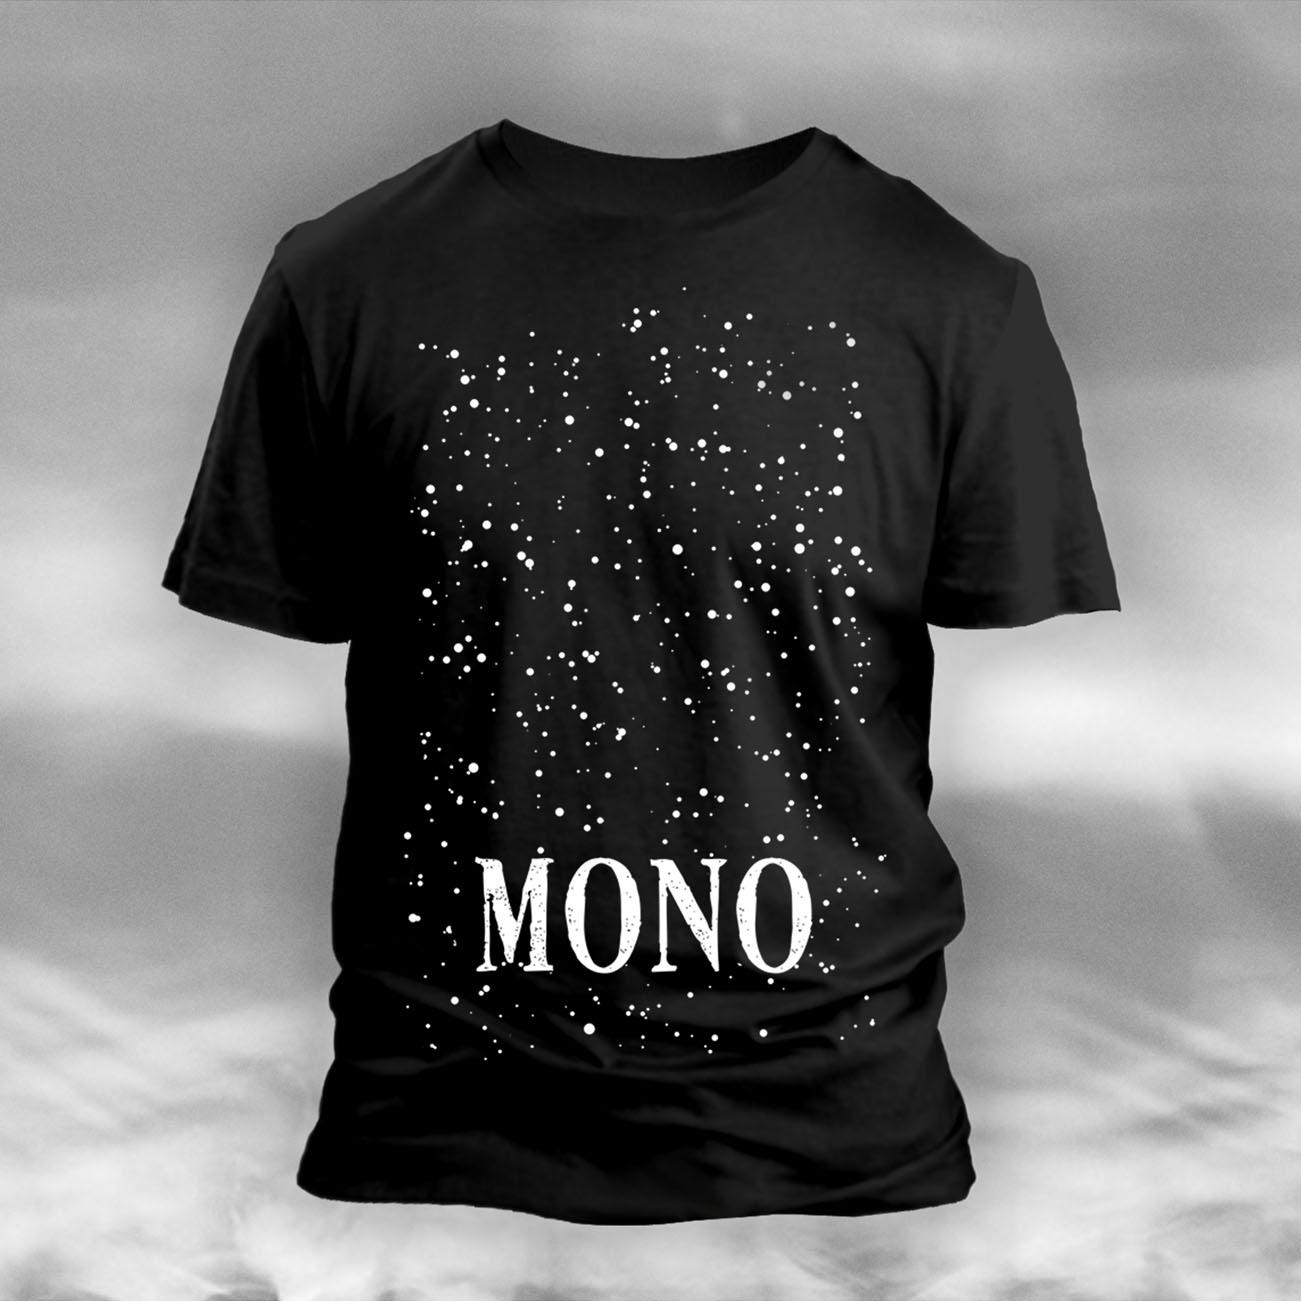 MONO - 'Snow' T-Shirt - MONO